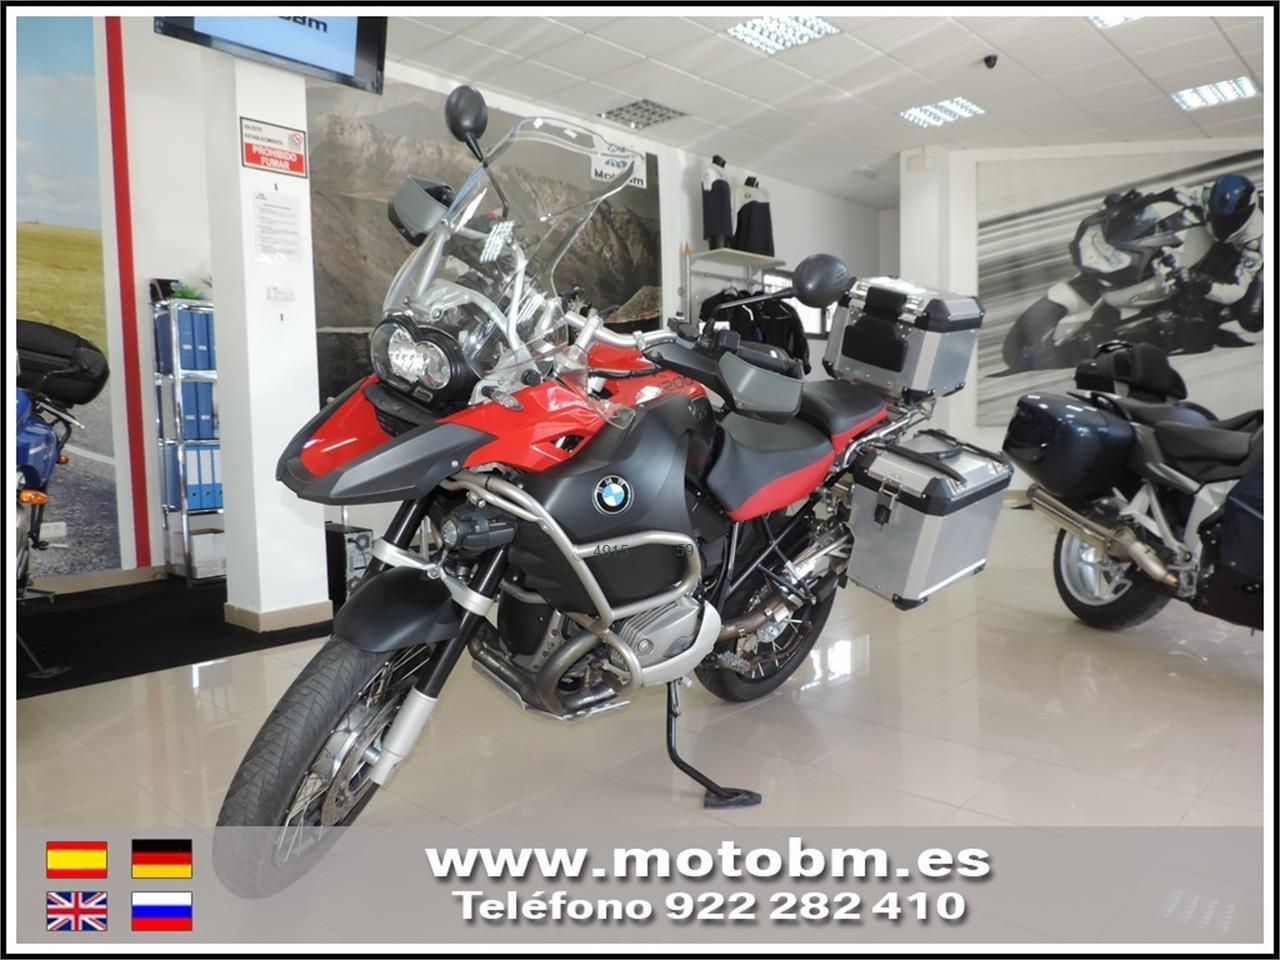 BMW R 1200 GS ADVENTURE 105CV